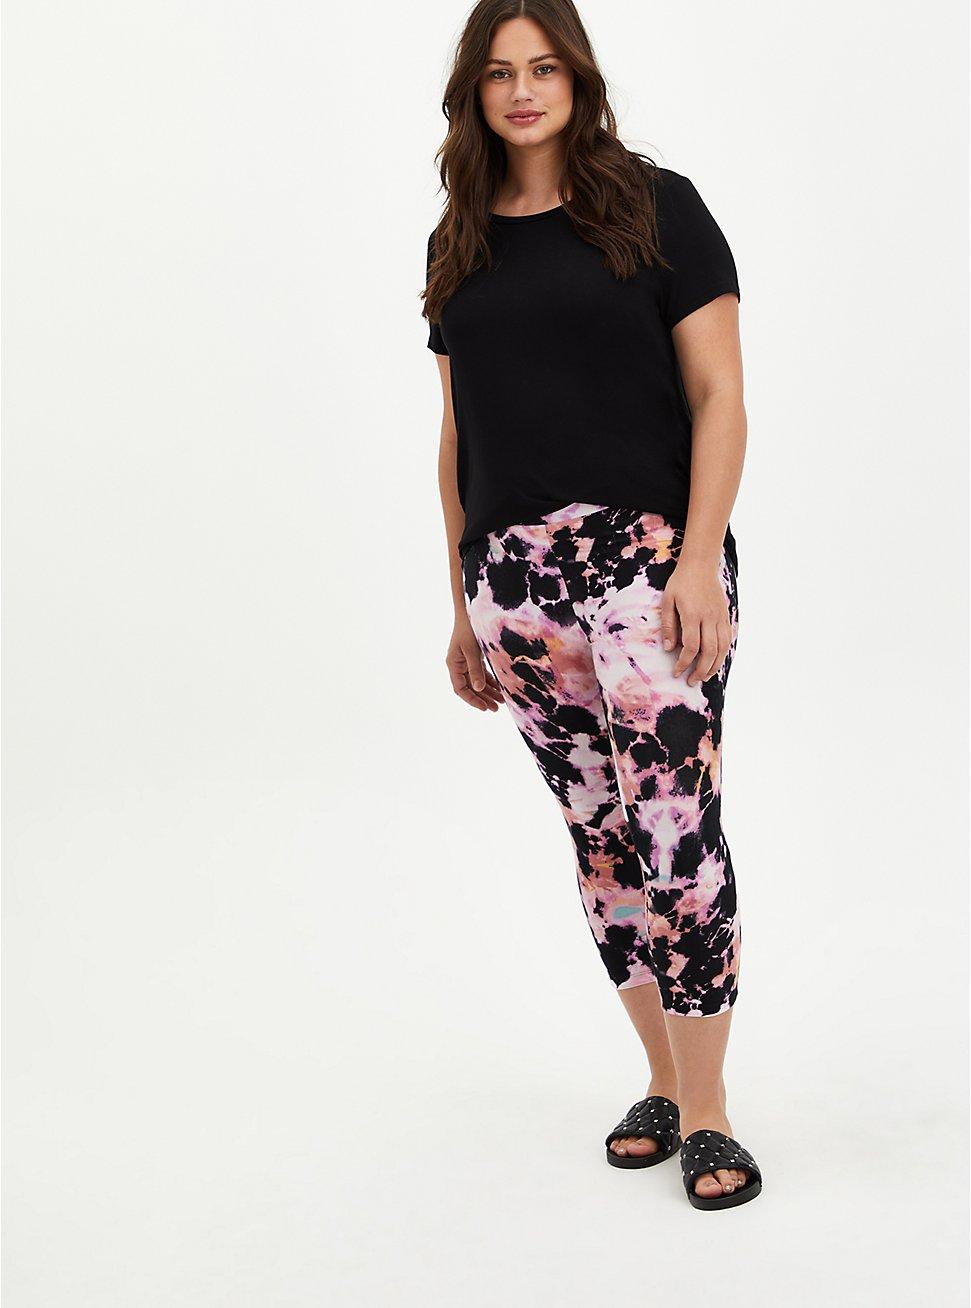 Capri Premium Legging - Bleached Tie-Dye Pink, TIE DYE, hi-res